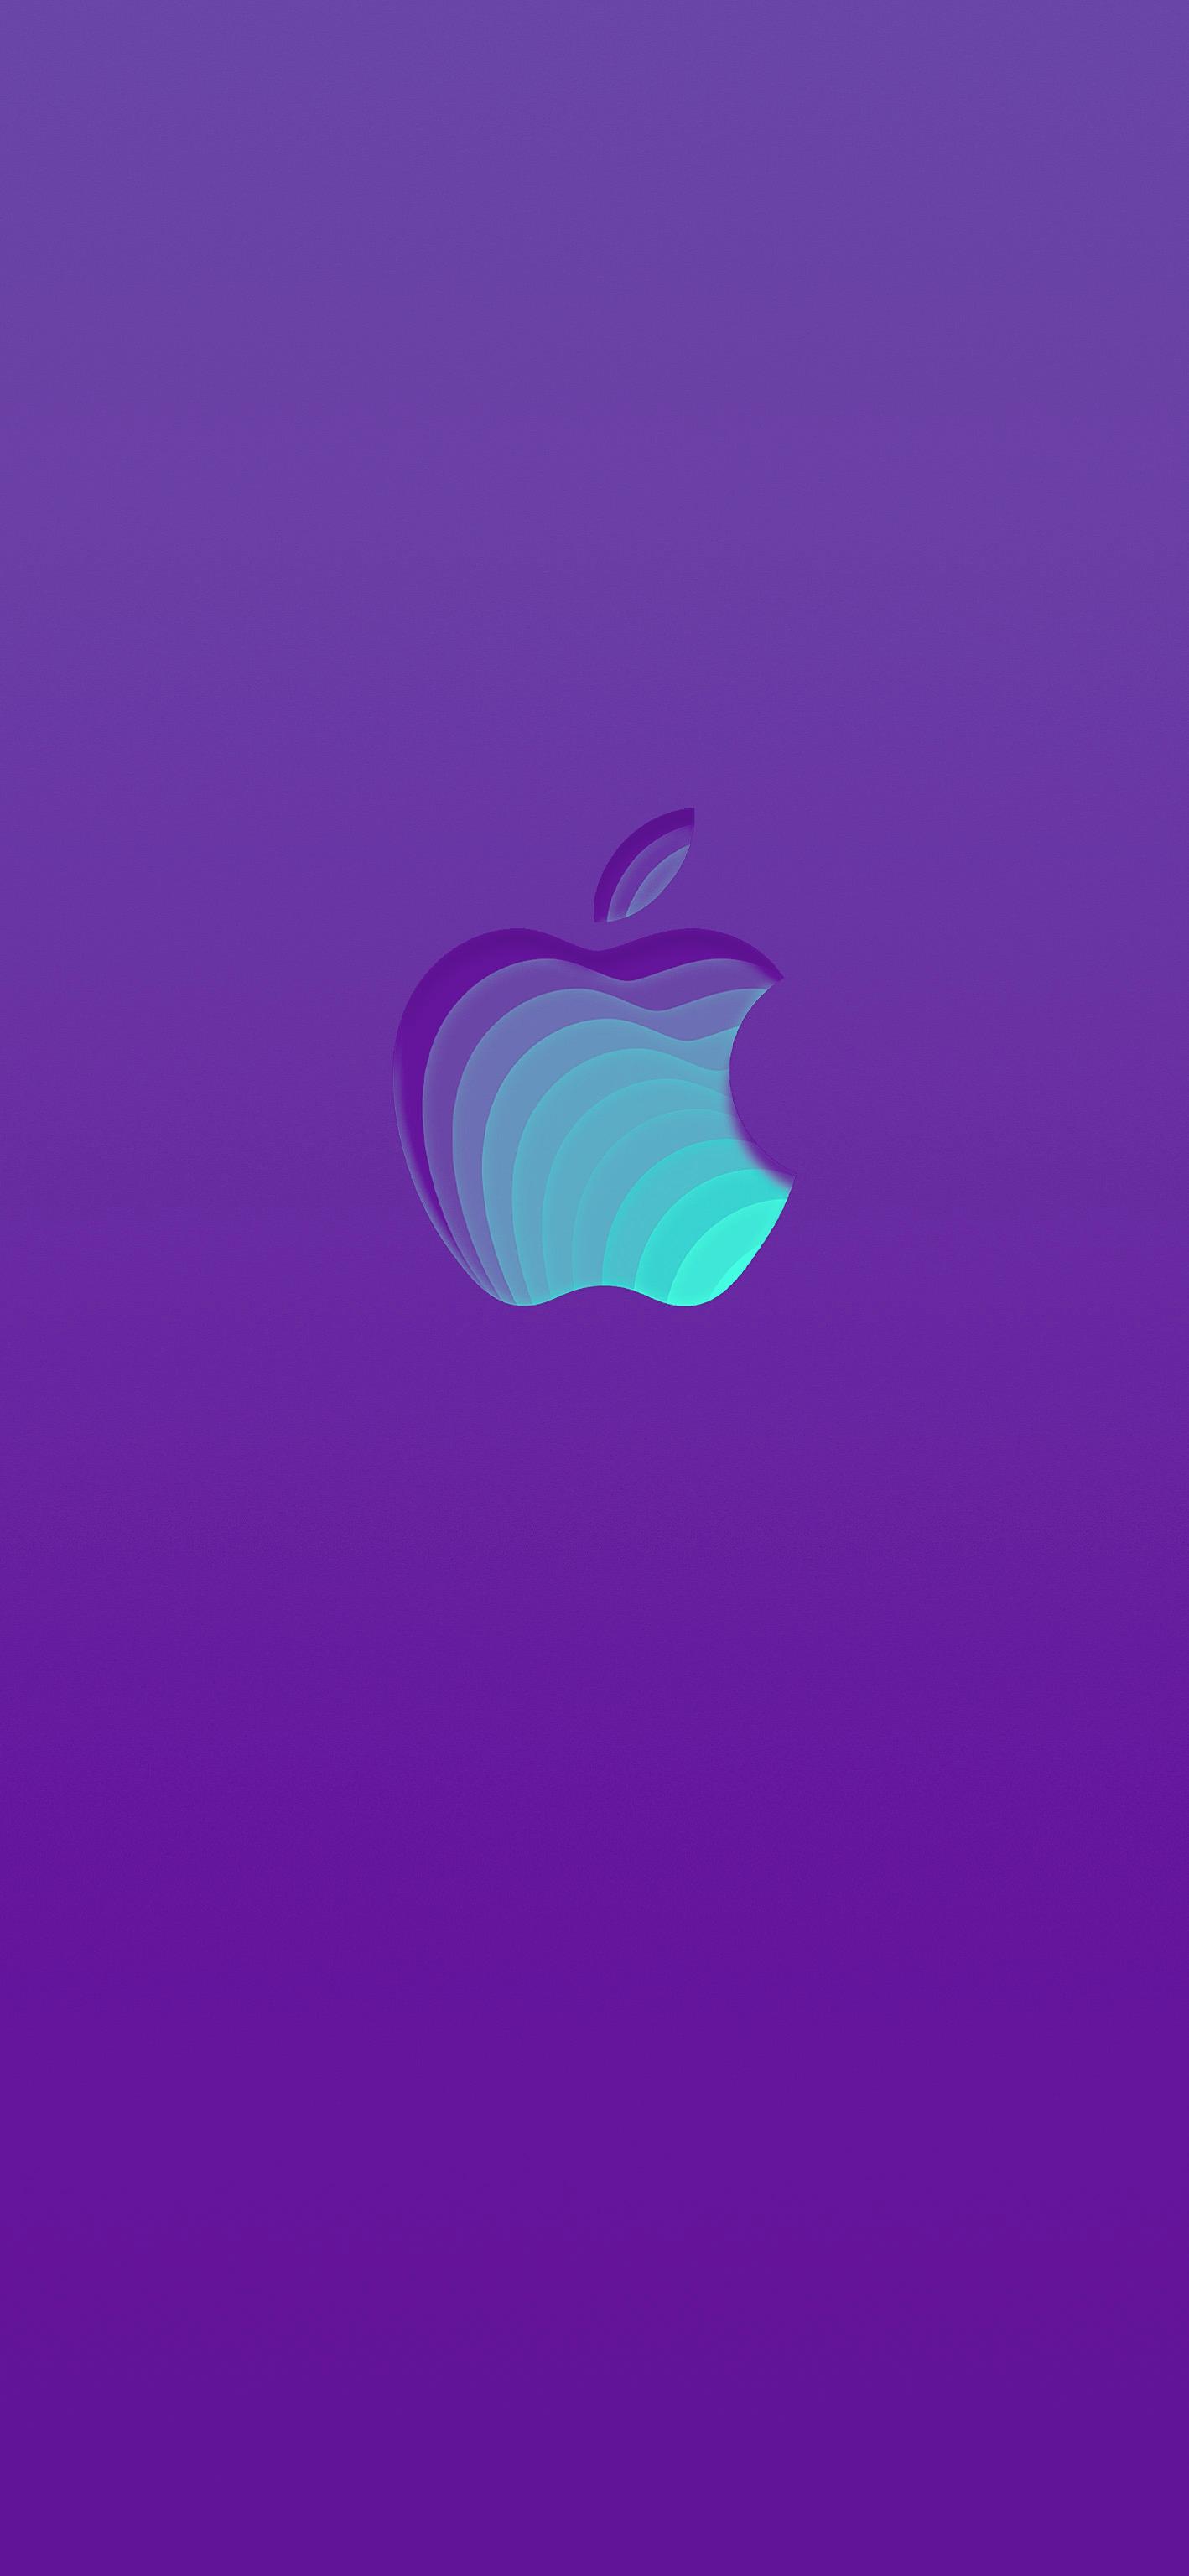 Ios13 Iphonewallpaper Apple Logo Colorful Darkmode Lockscreen Ios13wallpaper Ios Apple Wallpaper Apple Iphone Wallpaper Hd Iphone Homescreen Wallpaper